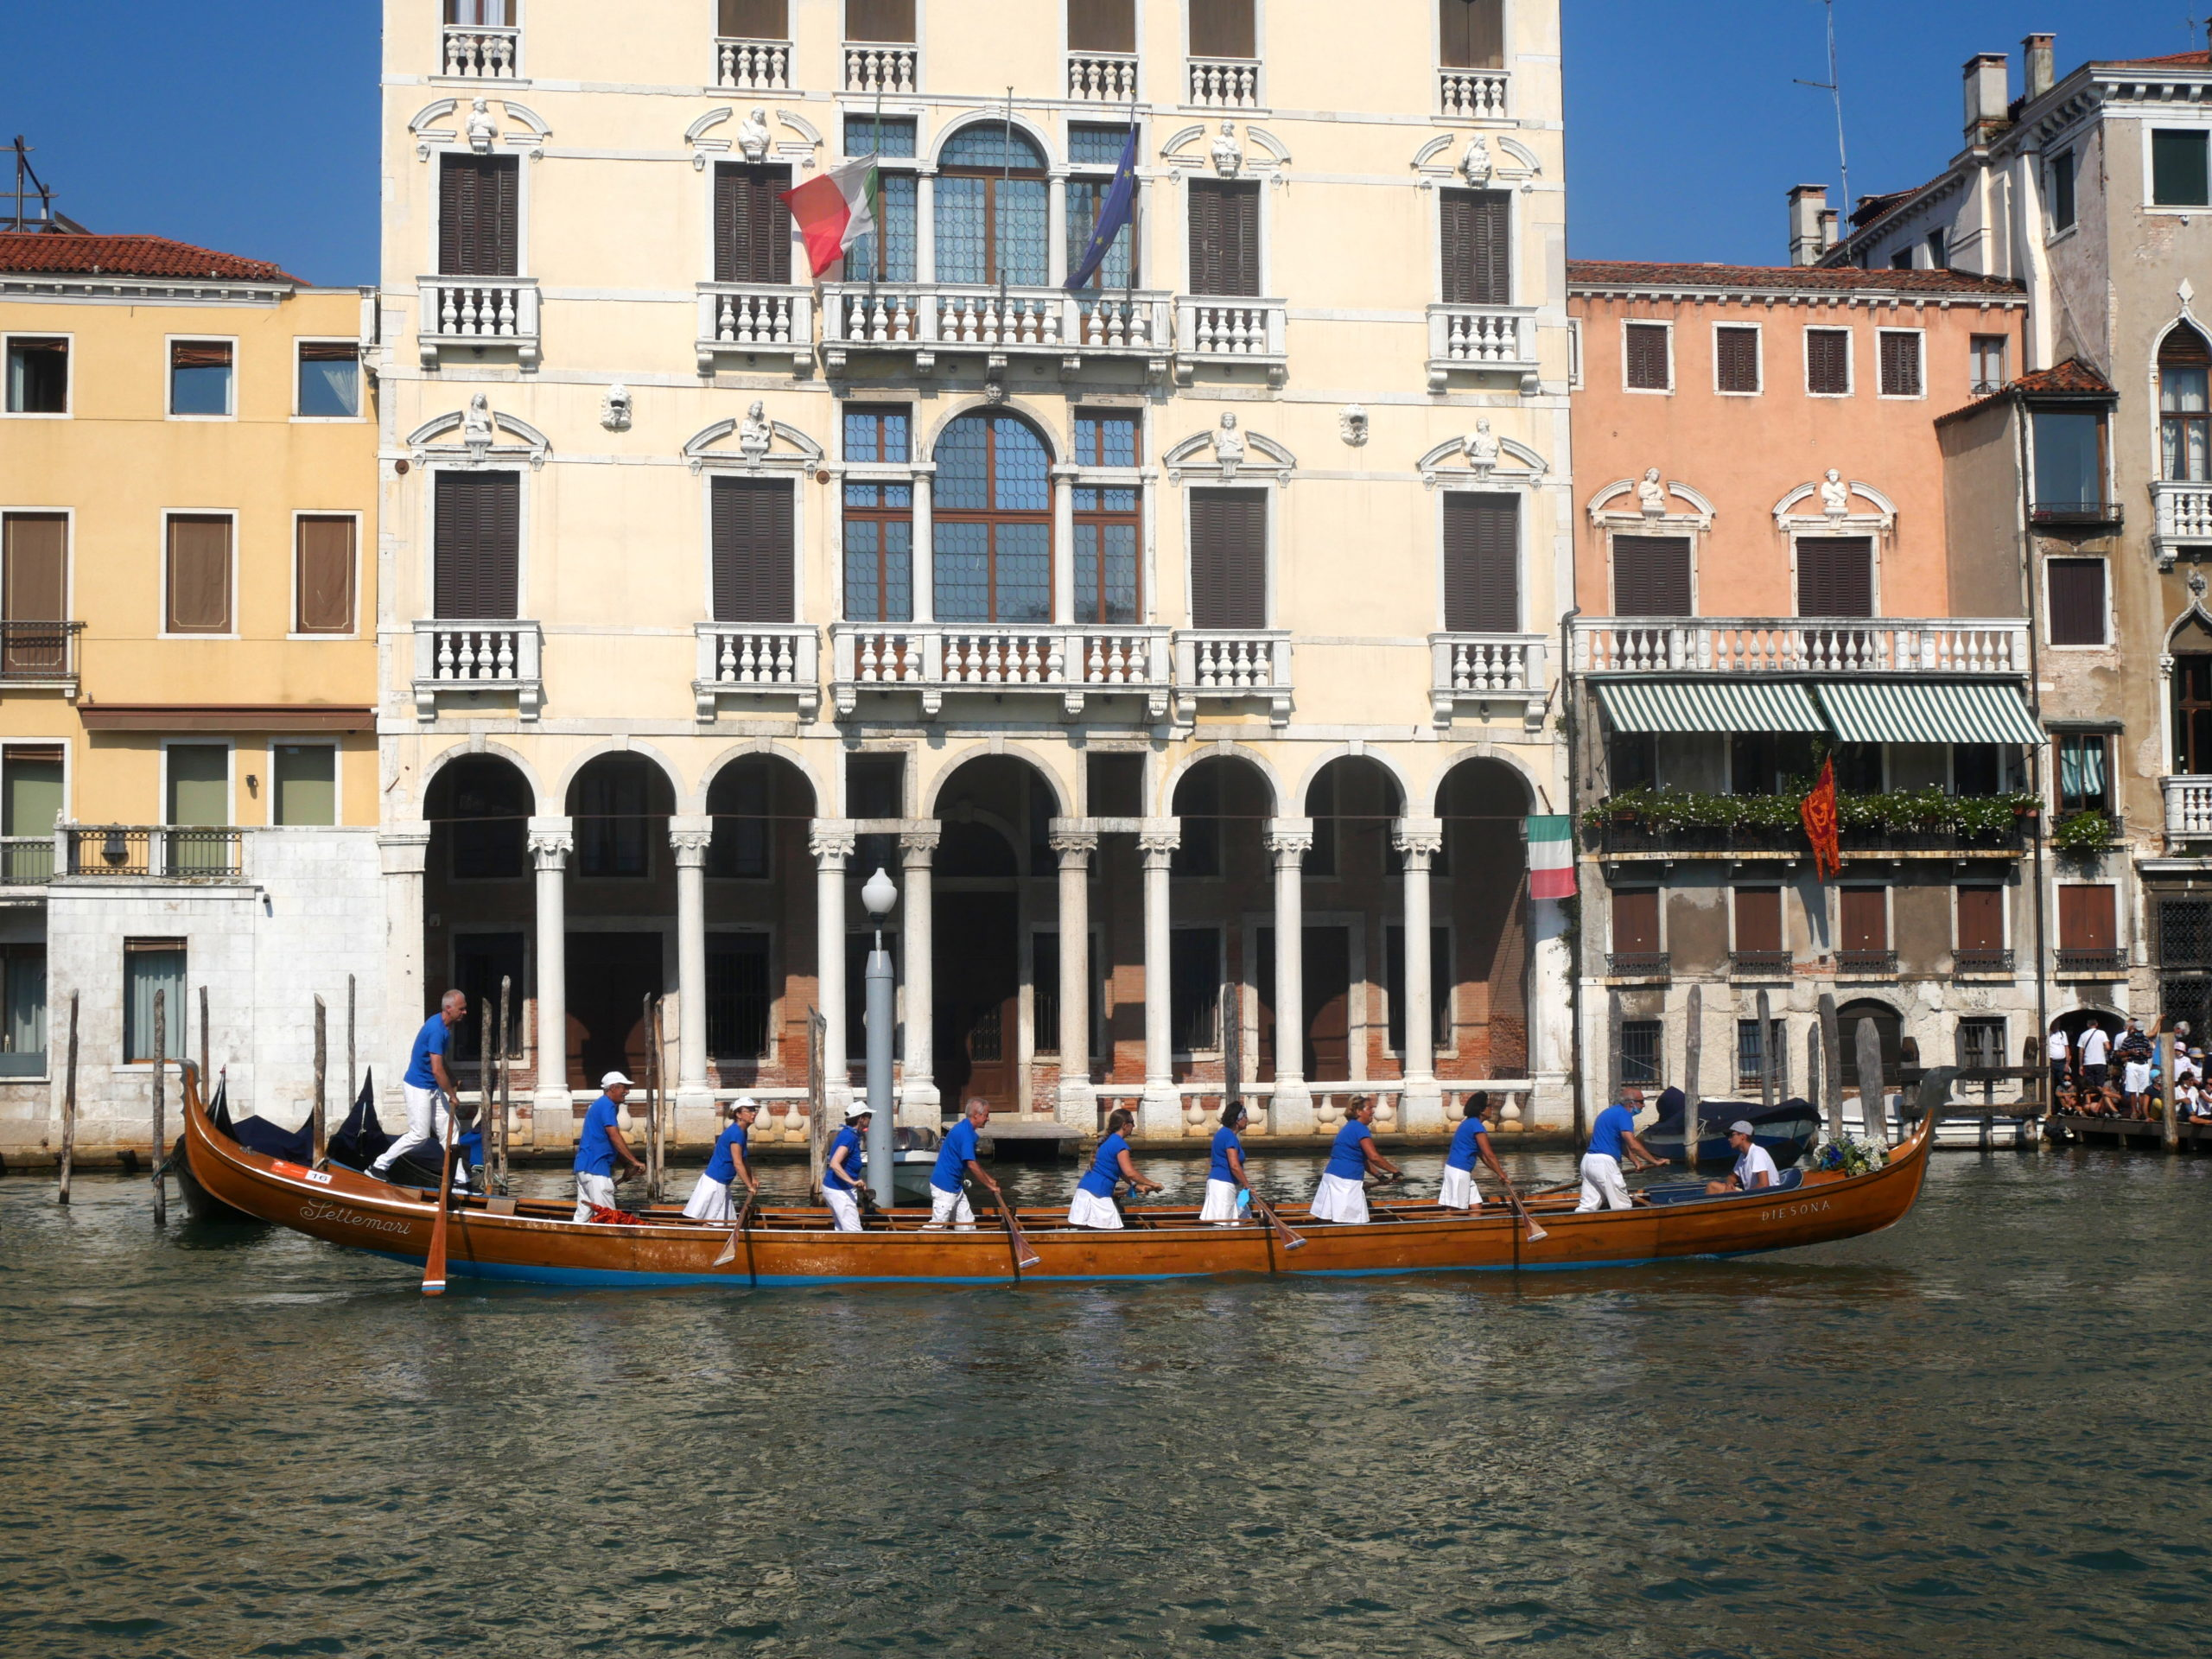 Bateau 2 regata storica Venise